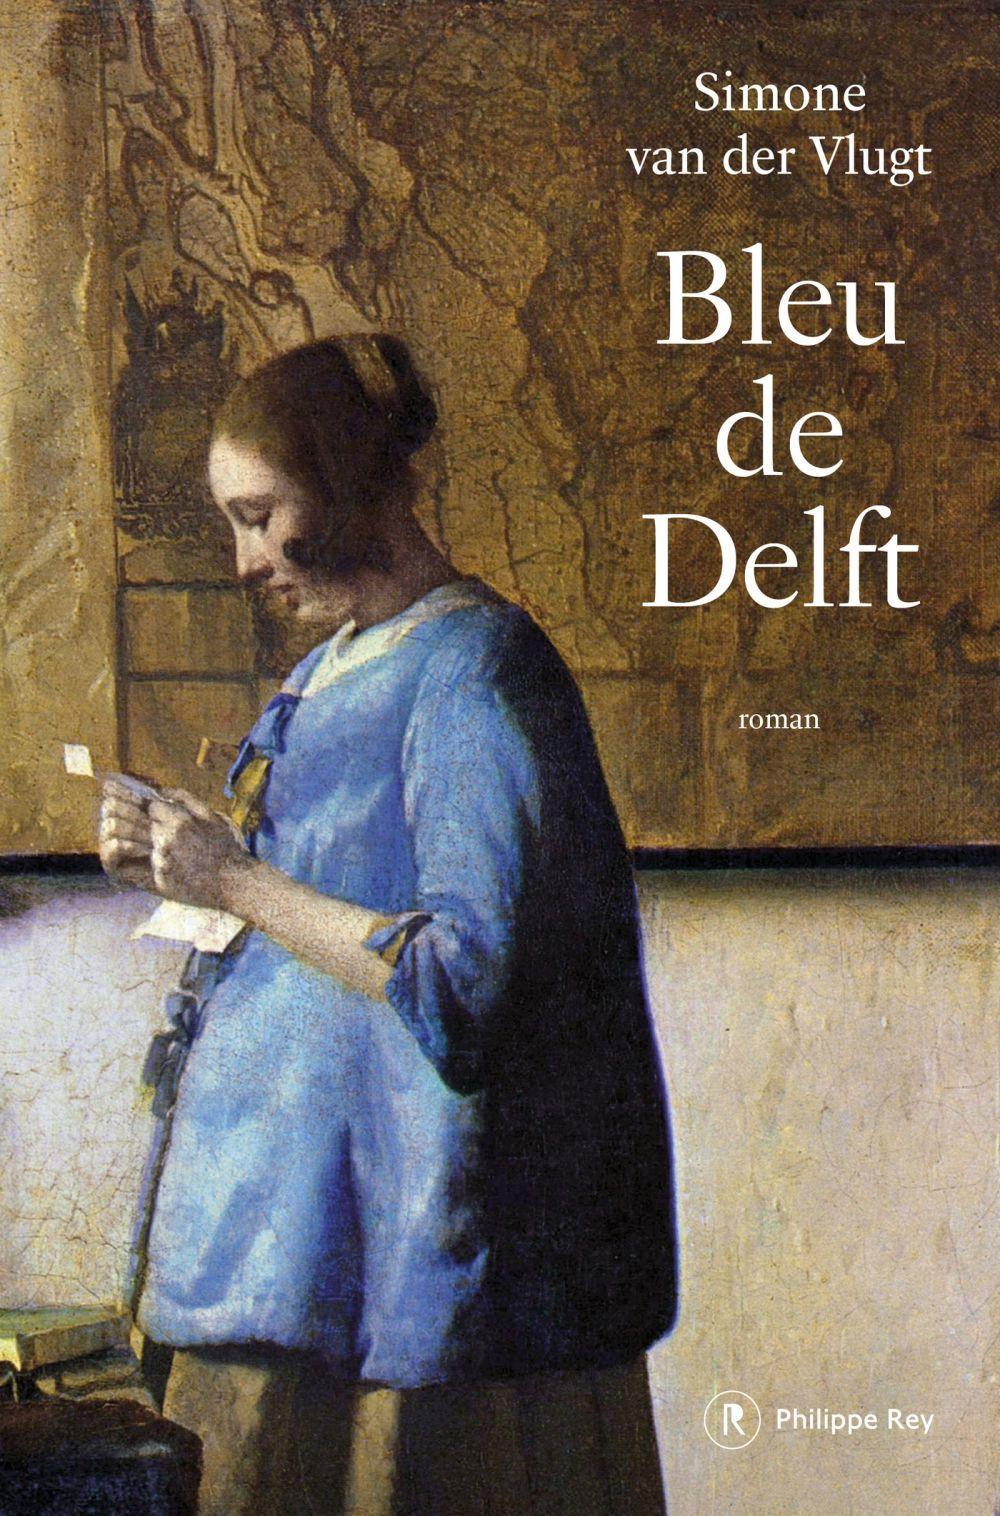 Bleu de Delft | Vlugt, Simone van der (1966-....). Auteur